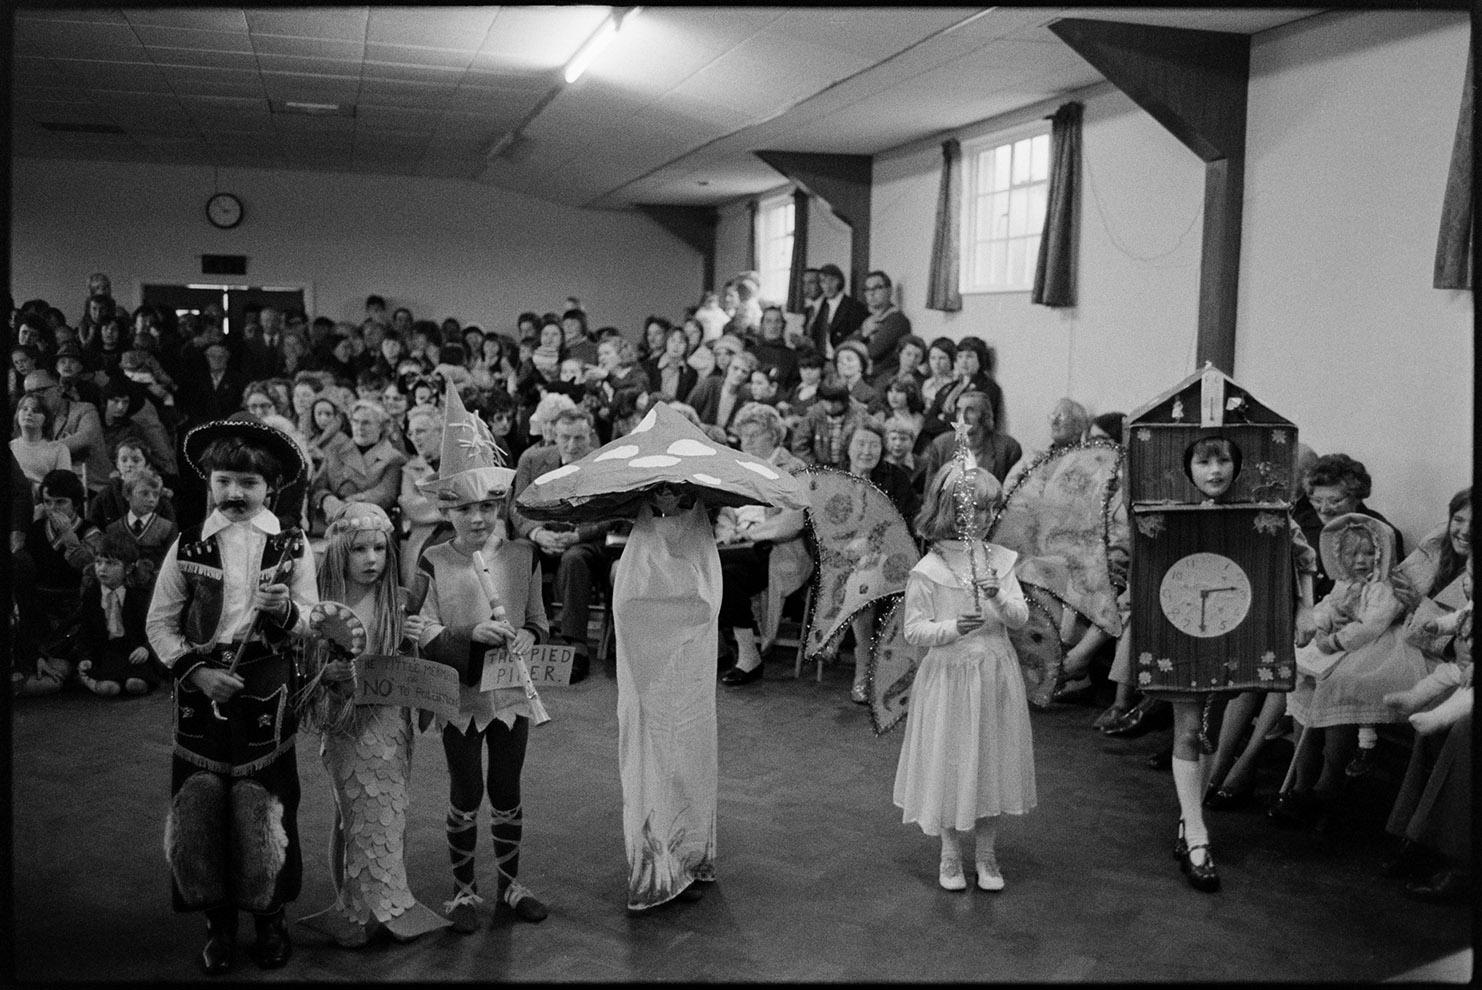 Children in fancy dress competition, Dolton, October 1975